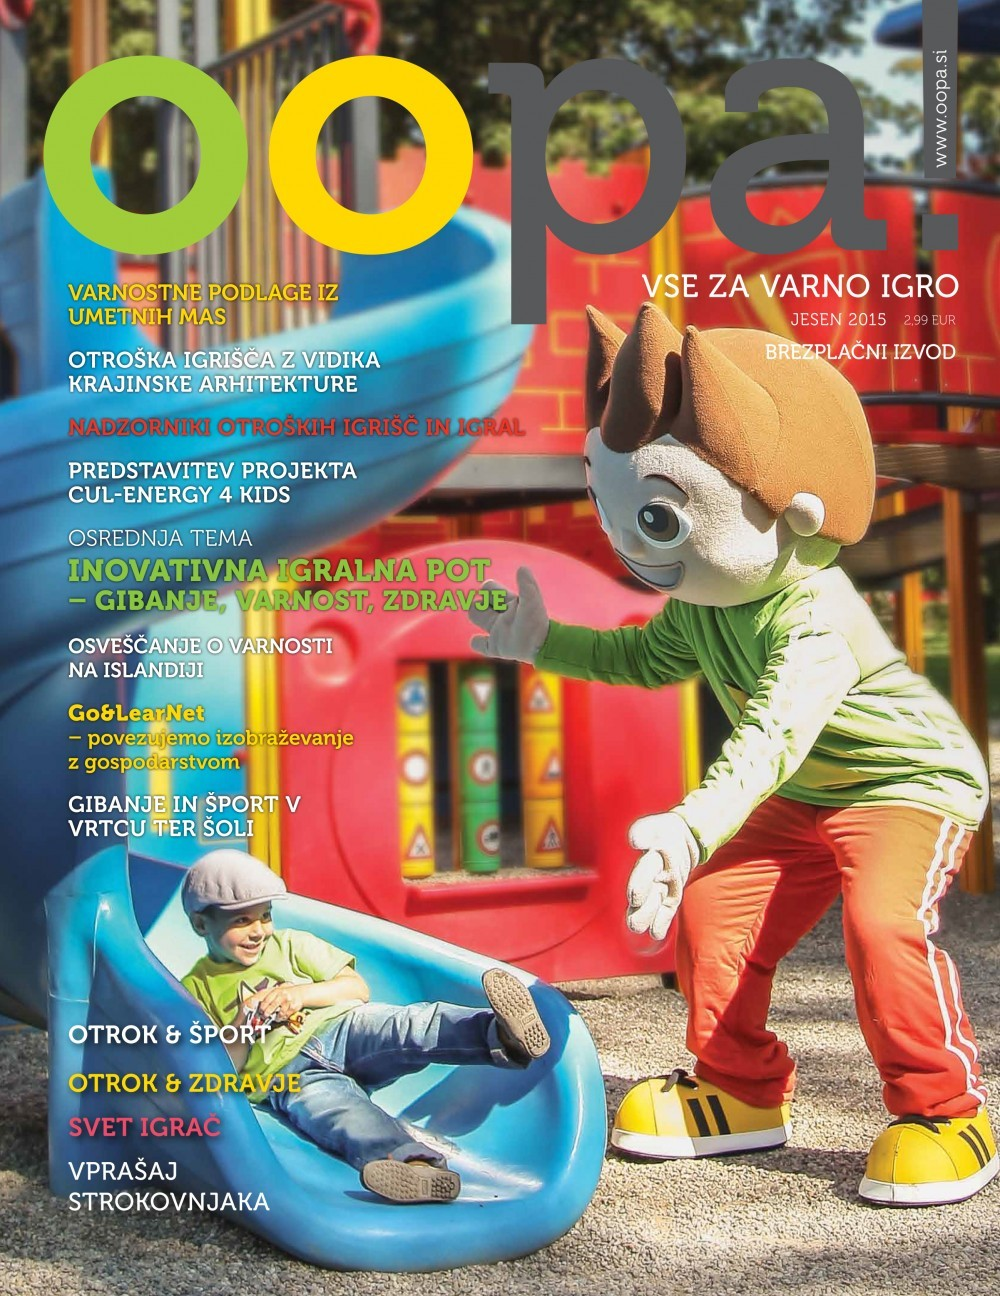 Oopa_ST5_revija-1